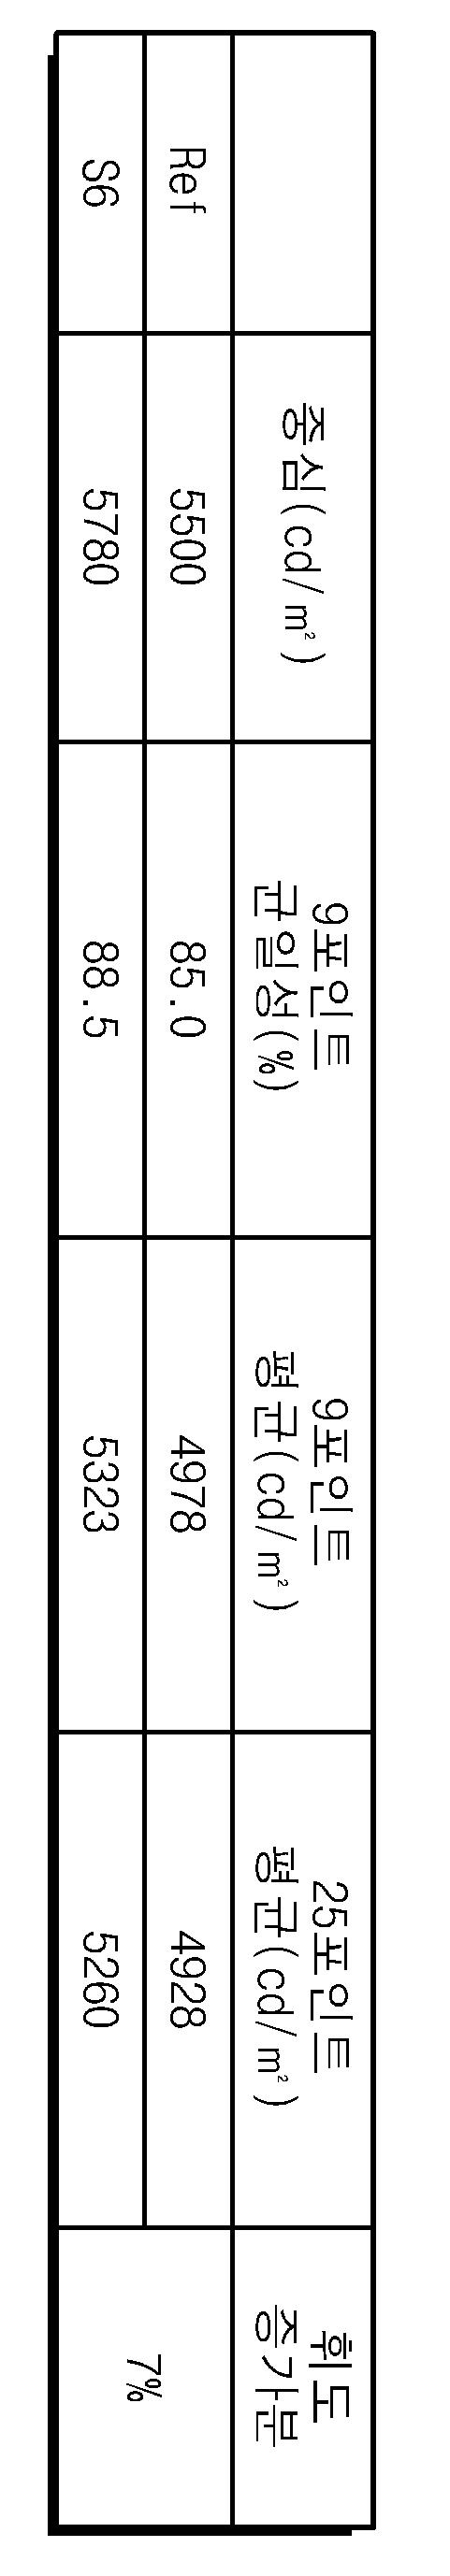 Figure 112006073202374-PAT00004